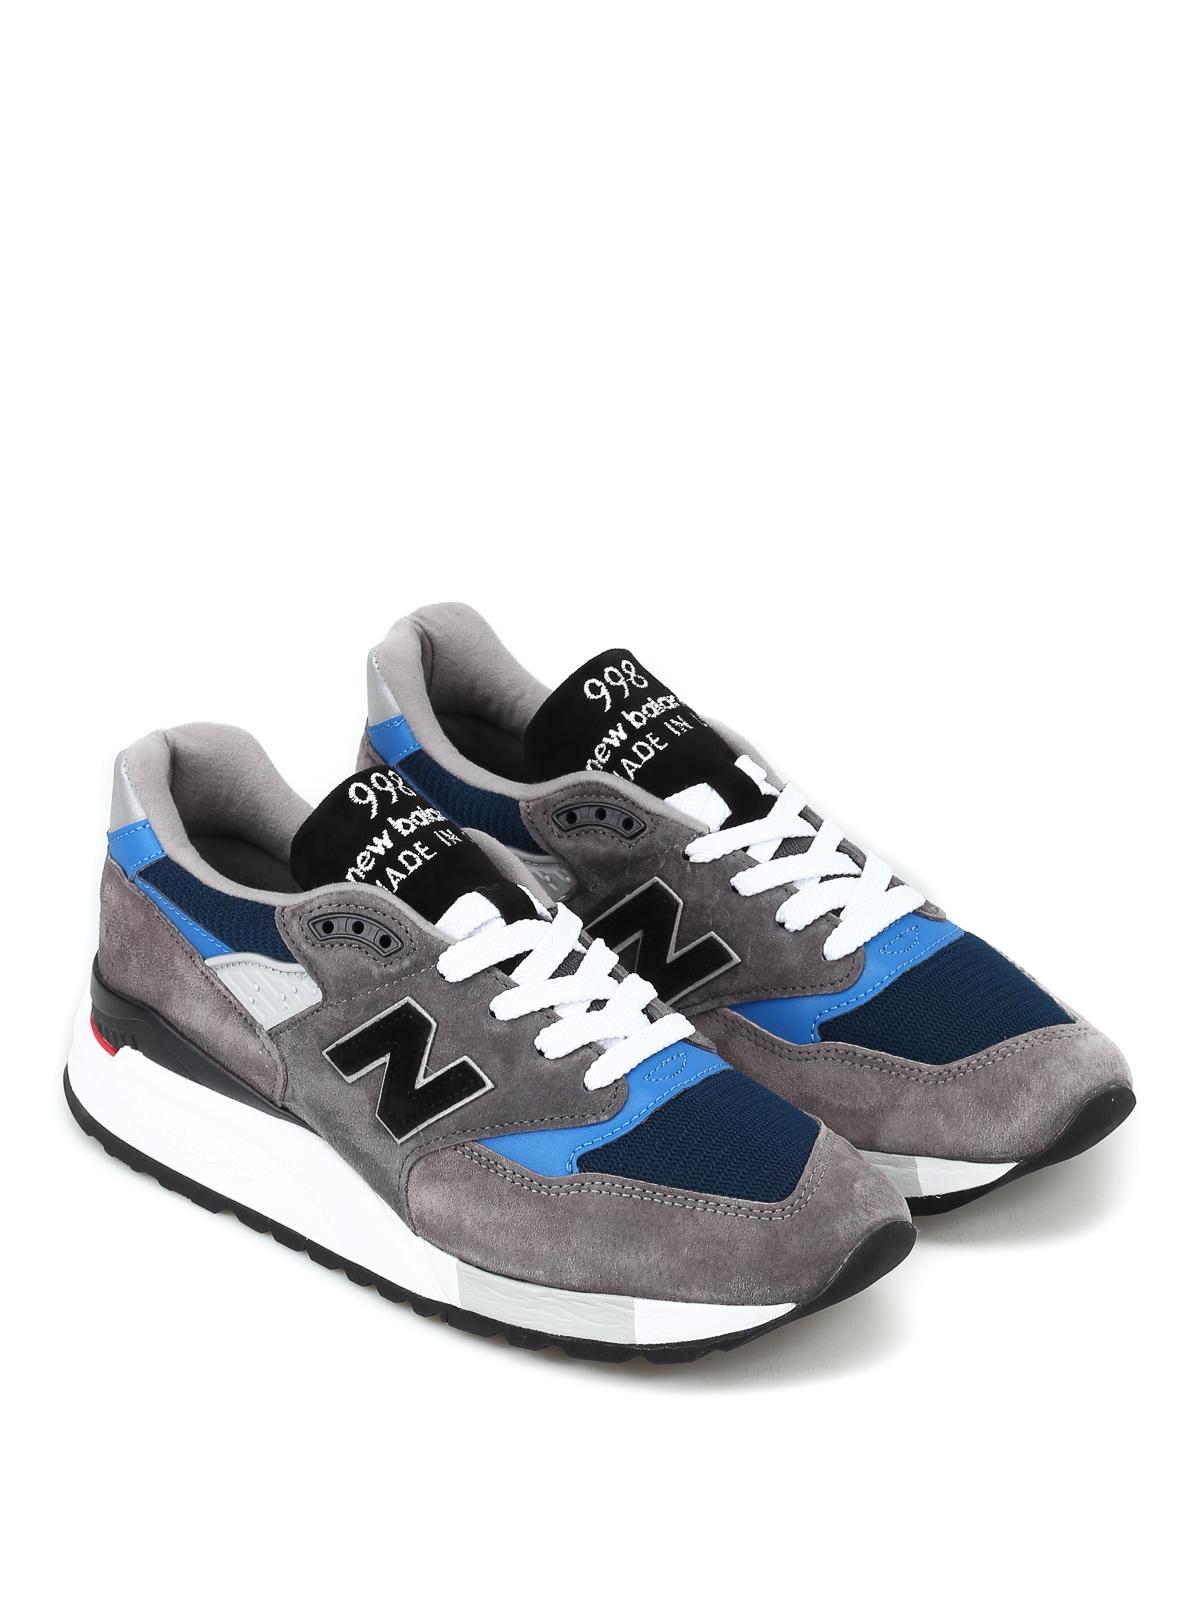 new concept 8553f b16f5 New Balance - 998 Desert Heat sneakers - trainers - M998NF ...